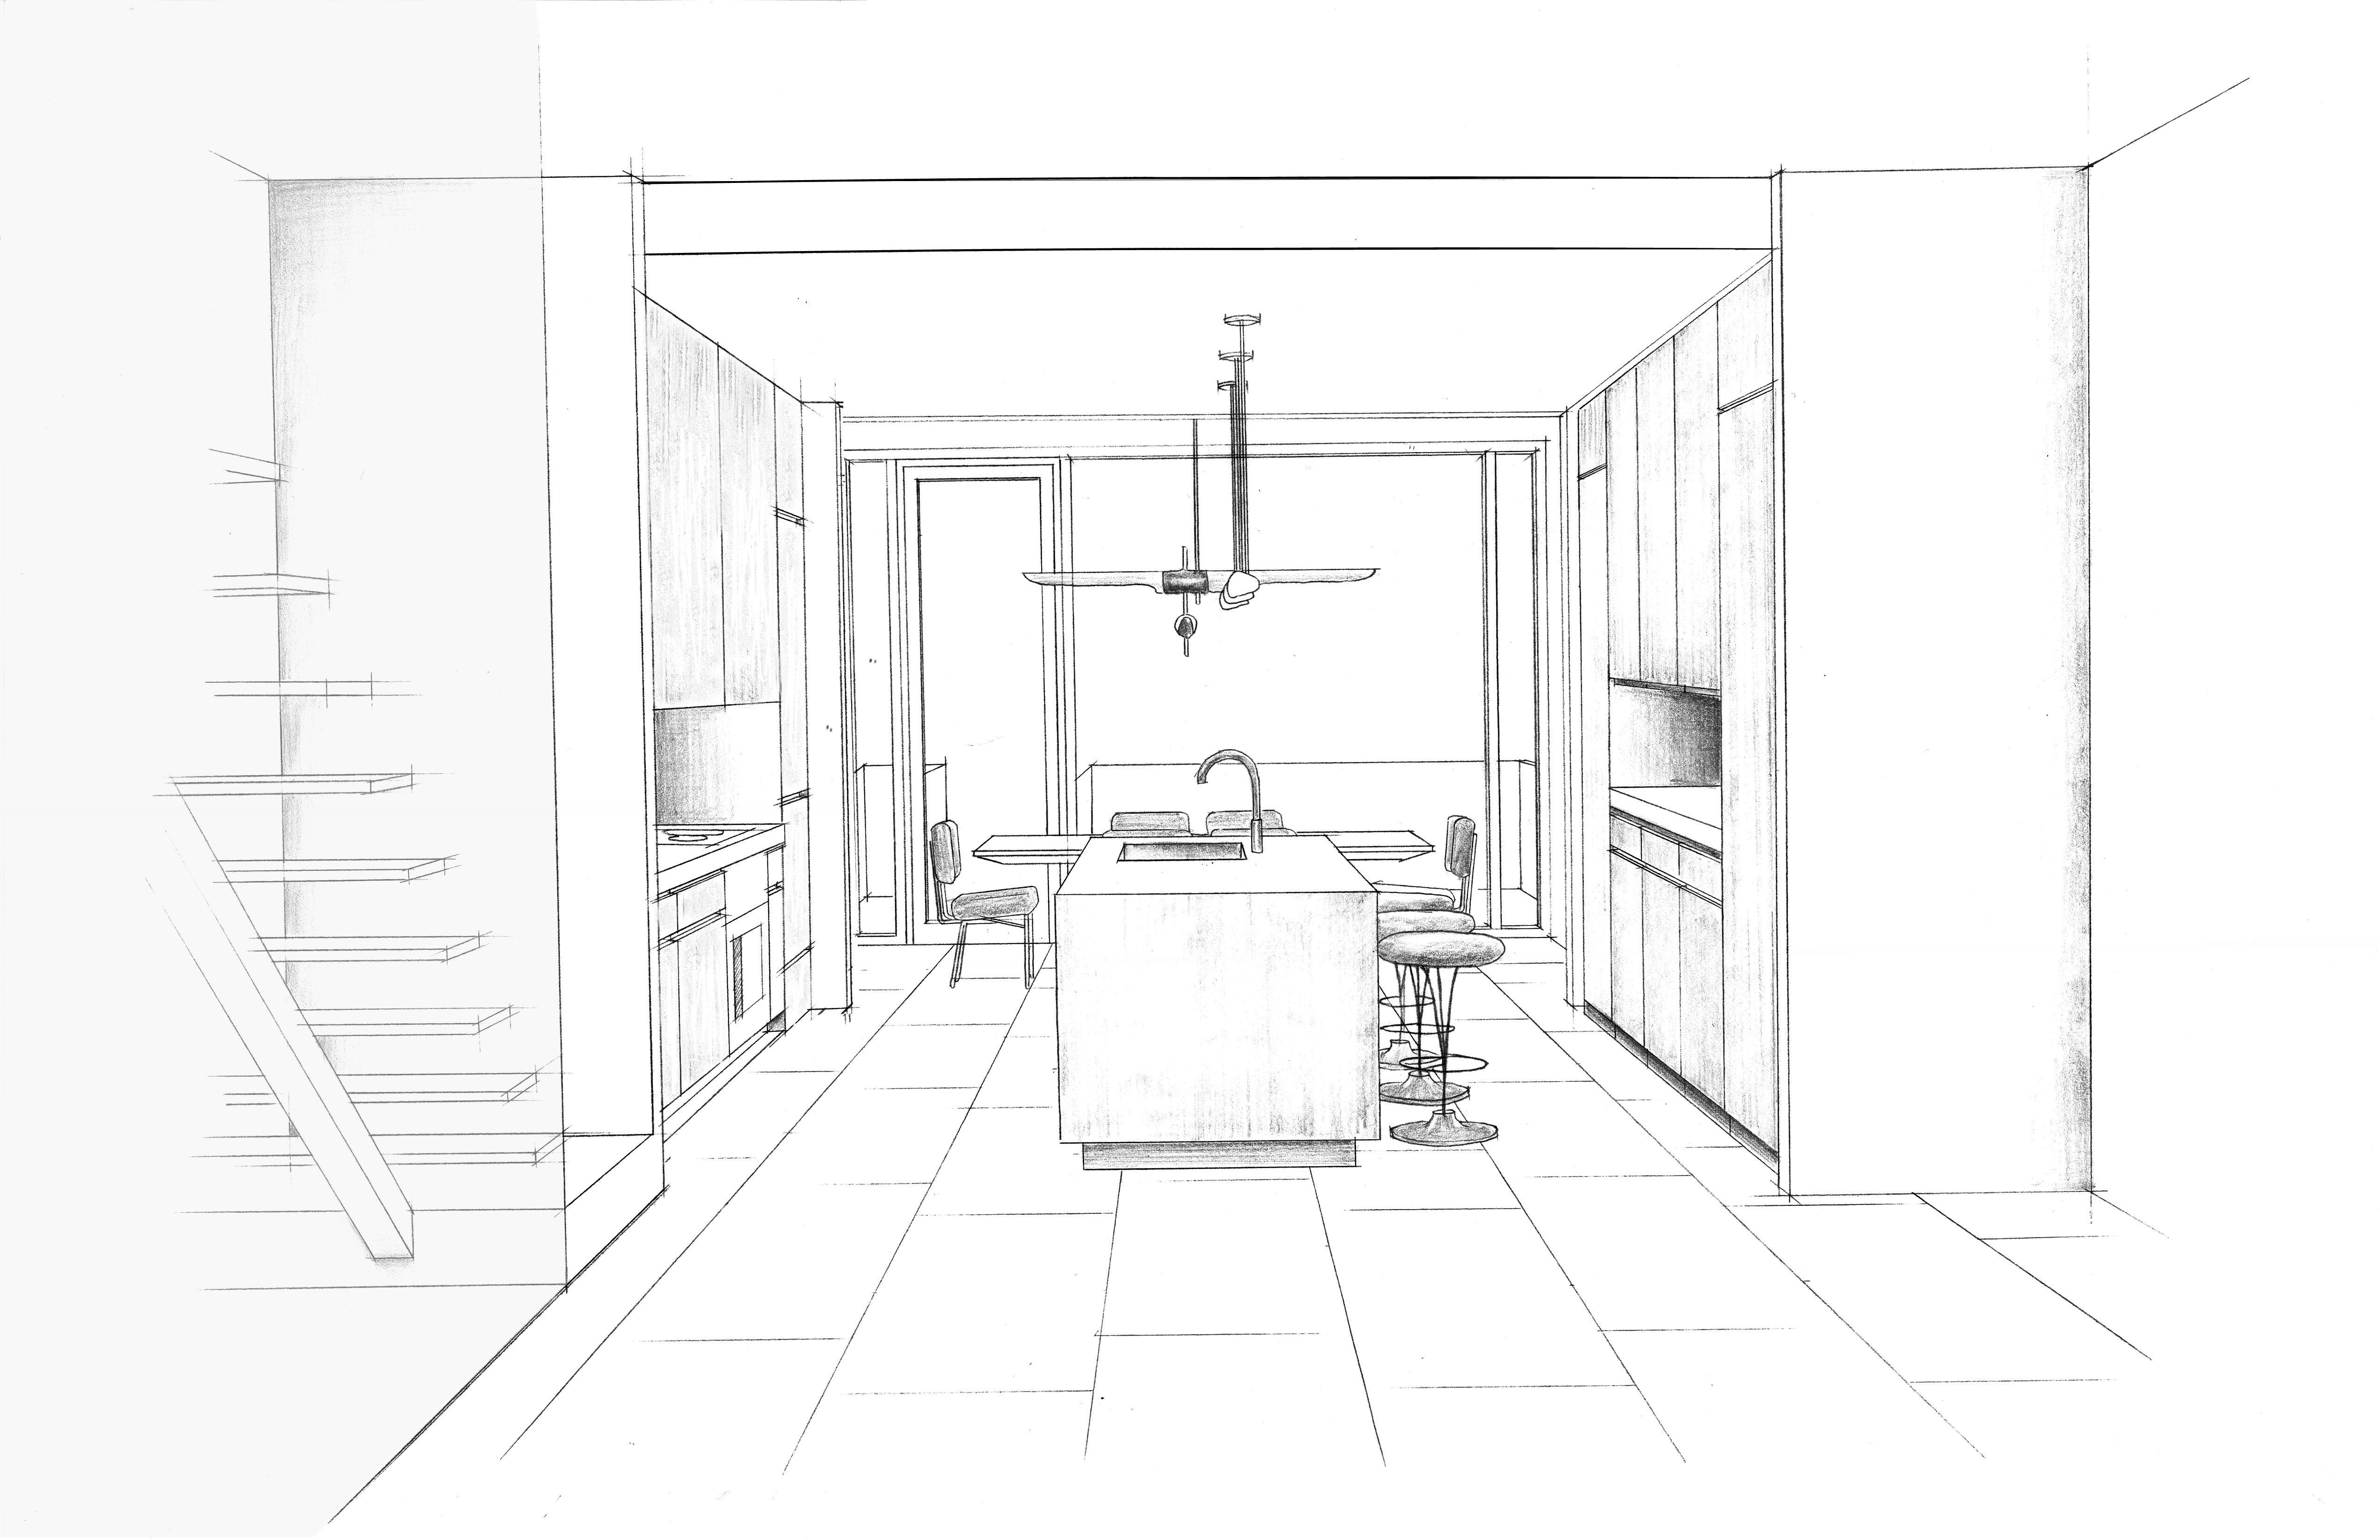 Rendering Architecture